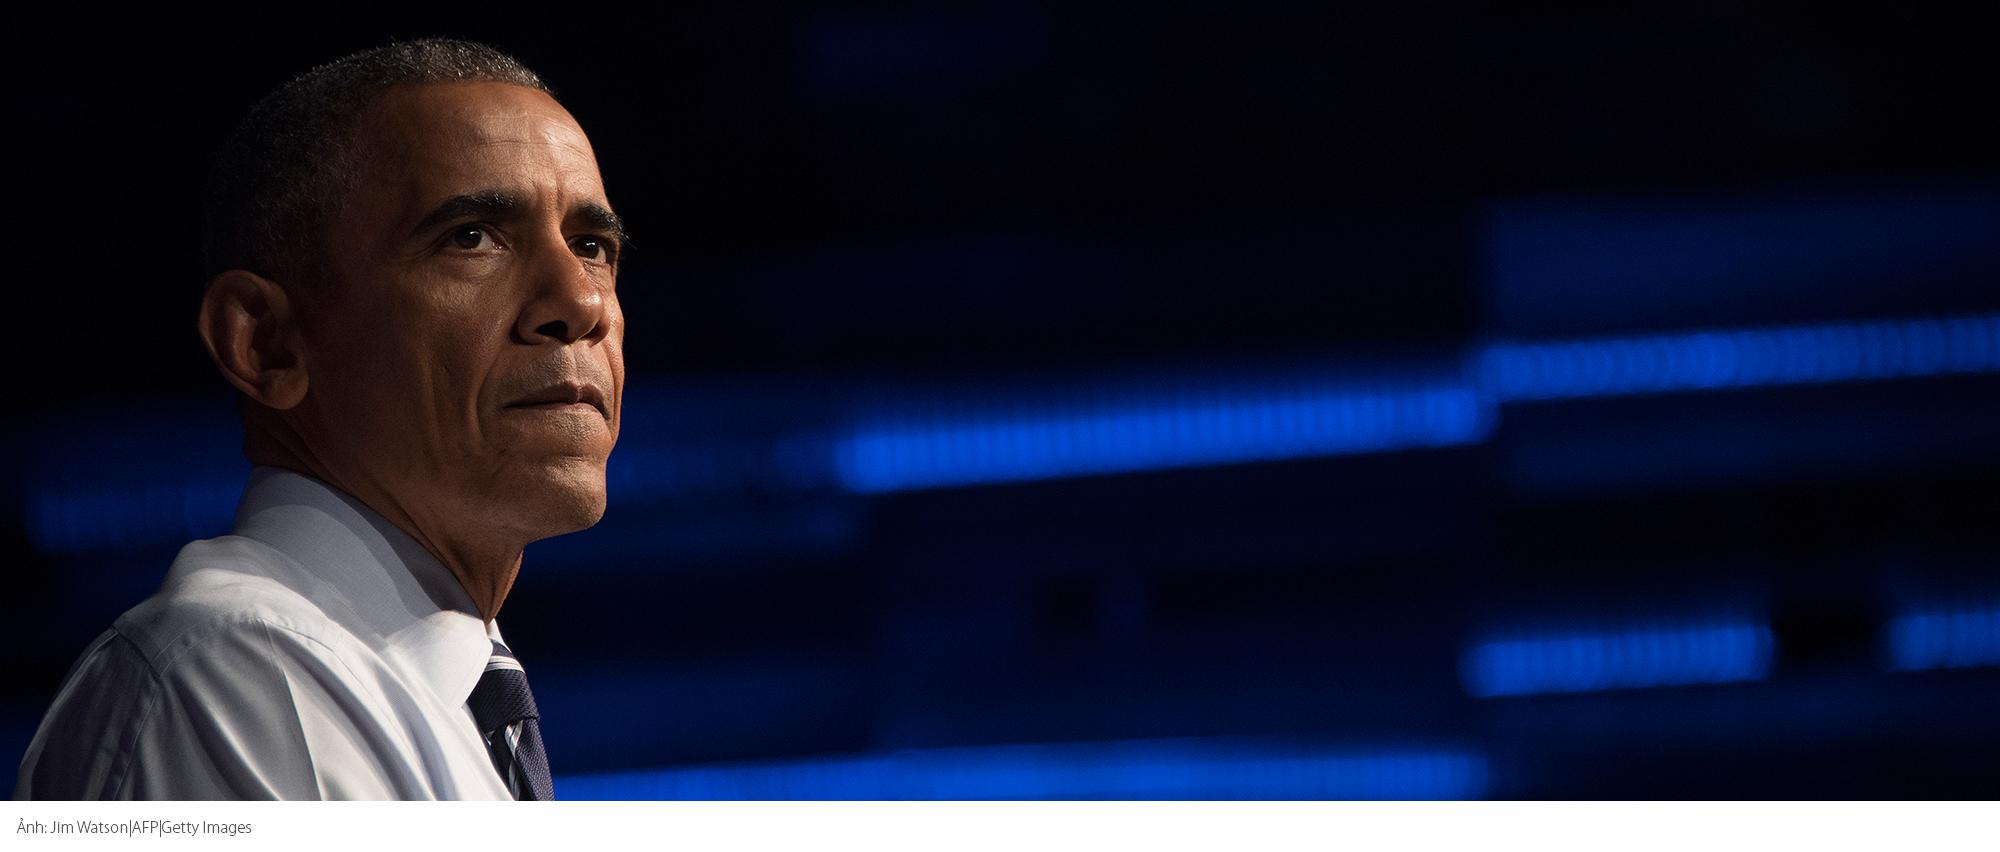 Tạm biệt, Barack Obama... - Ảnh 6.